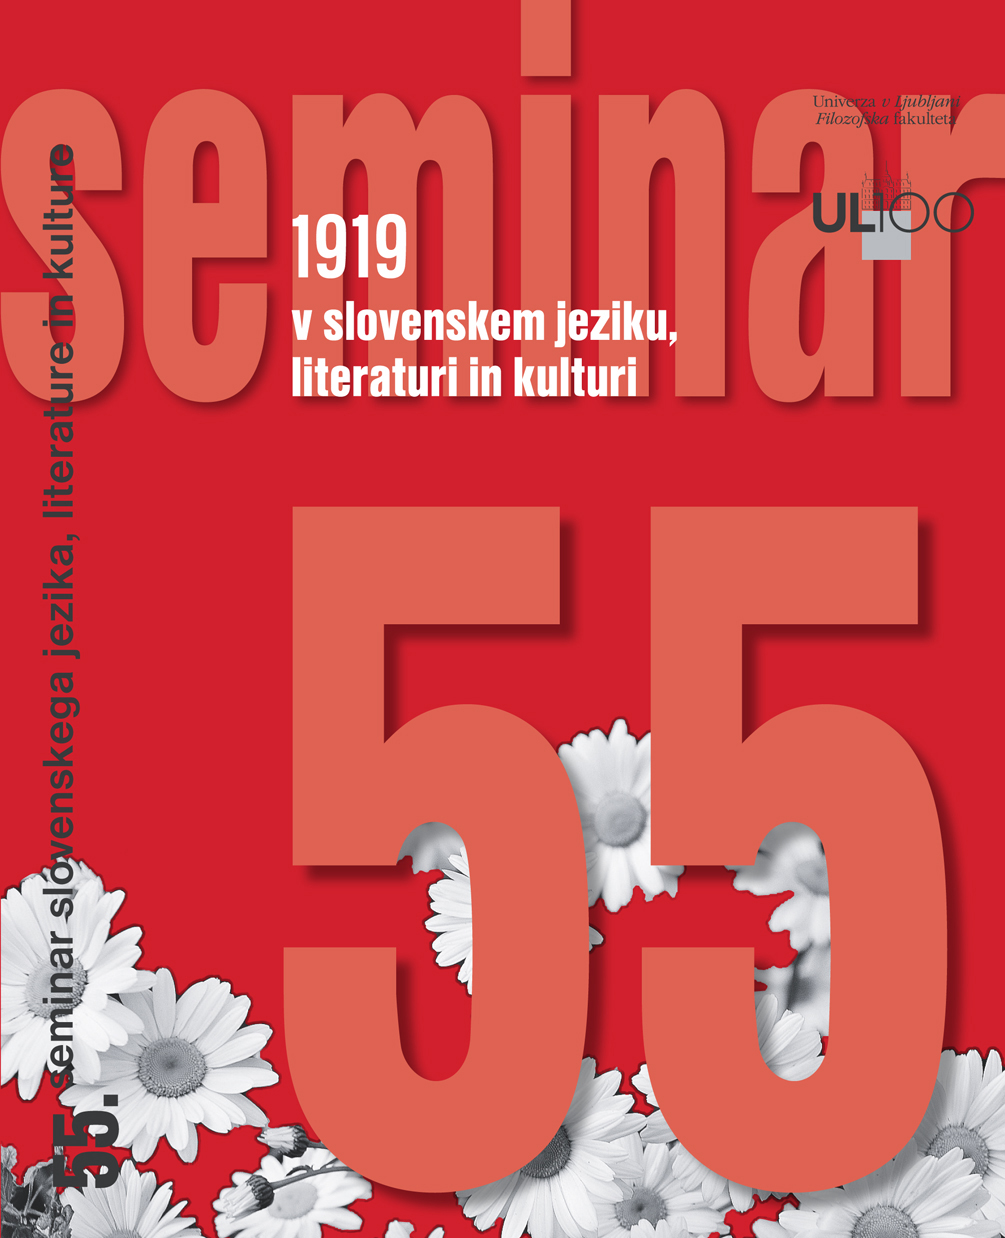 55. SSJLK (2019)